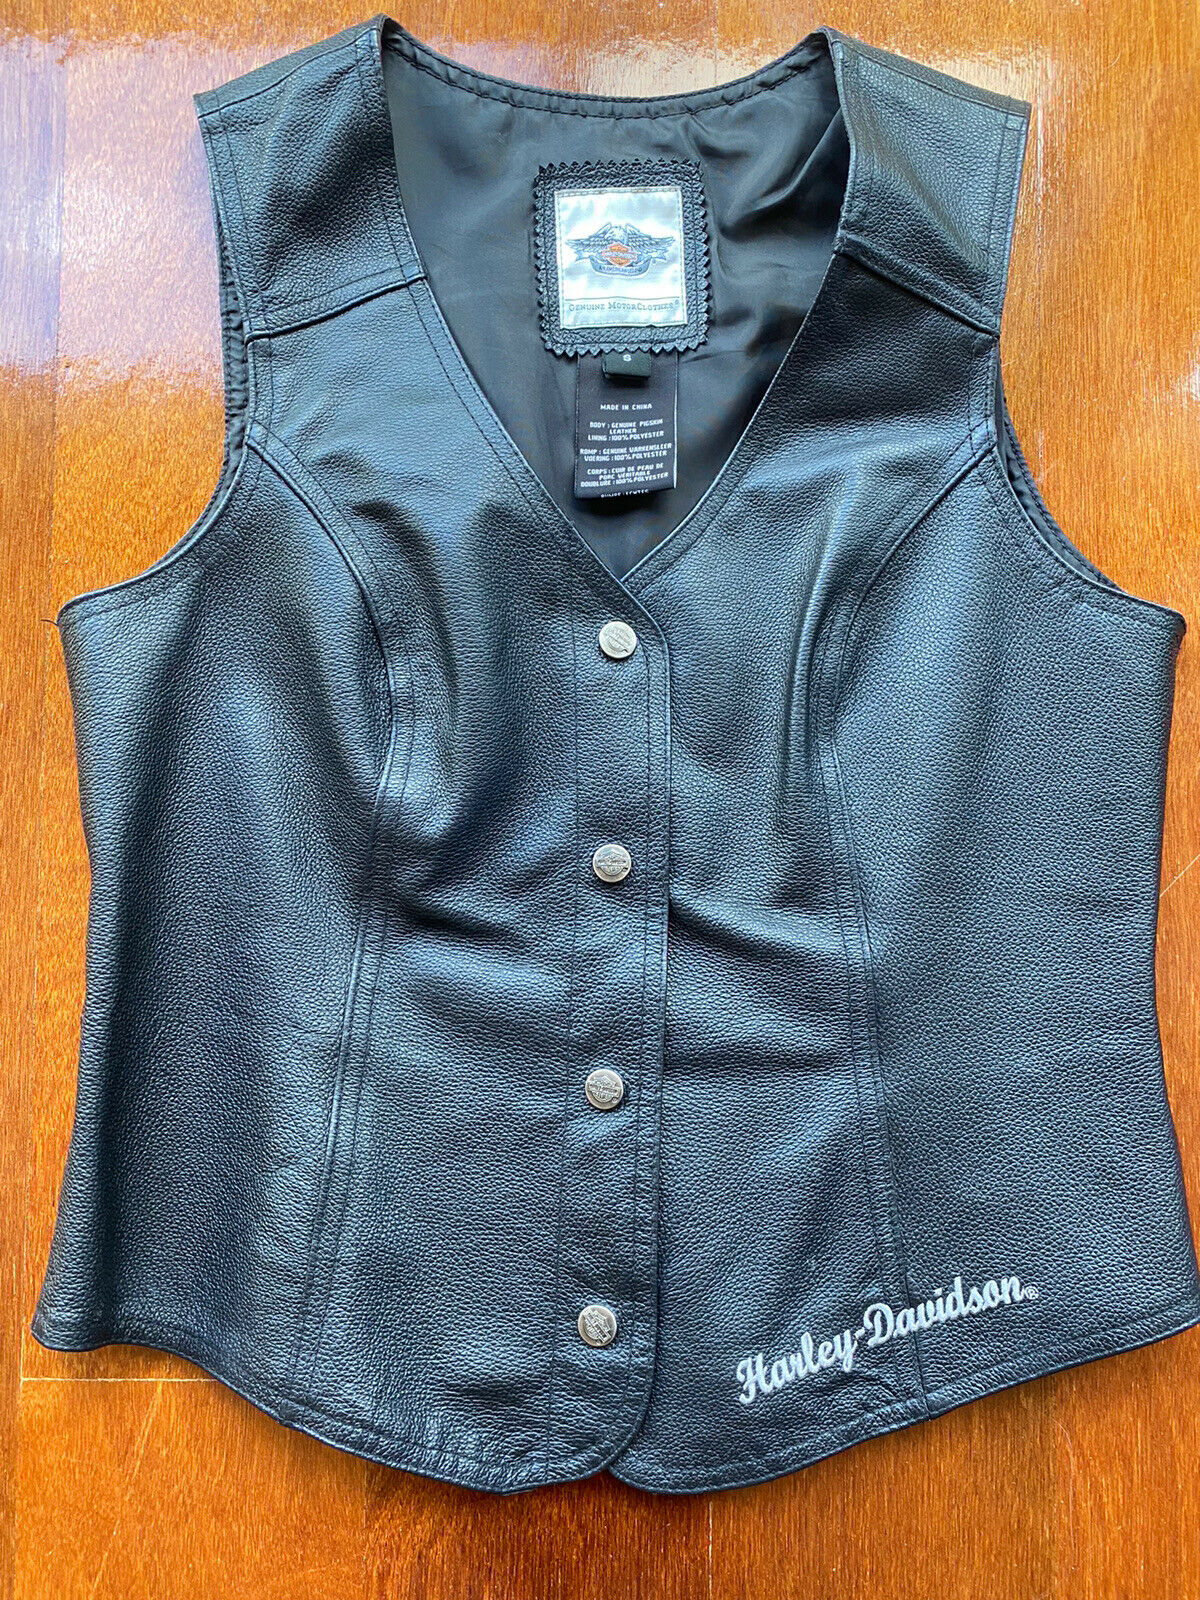 Authentic Ladies Harley Davidson Leather Vest Size S